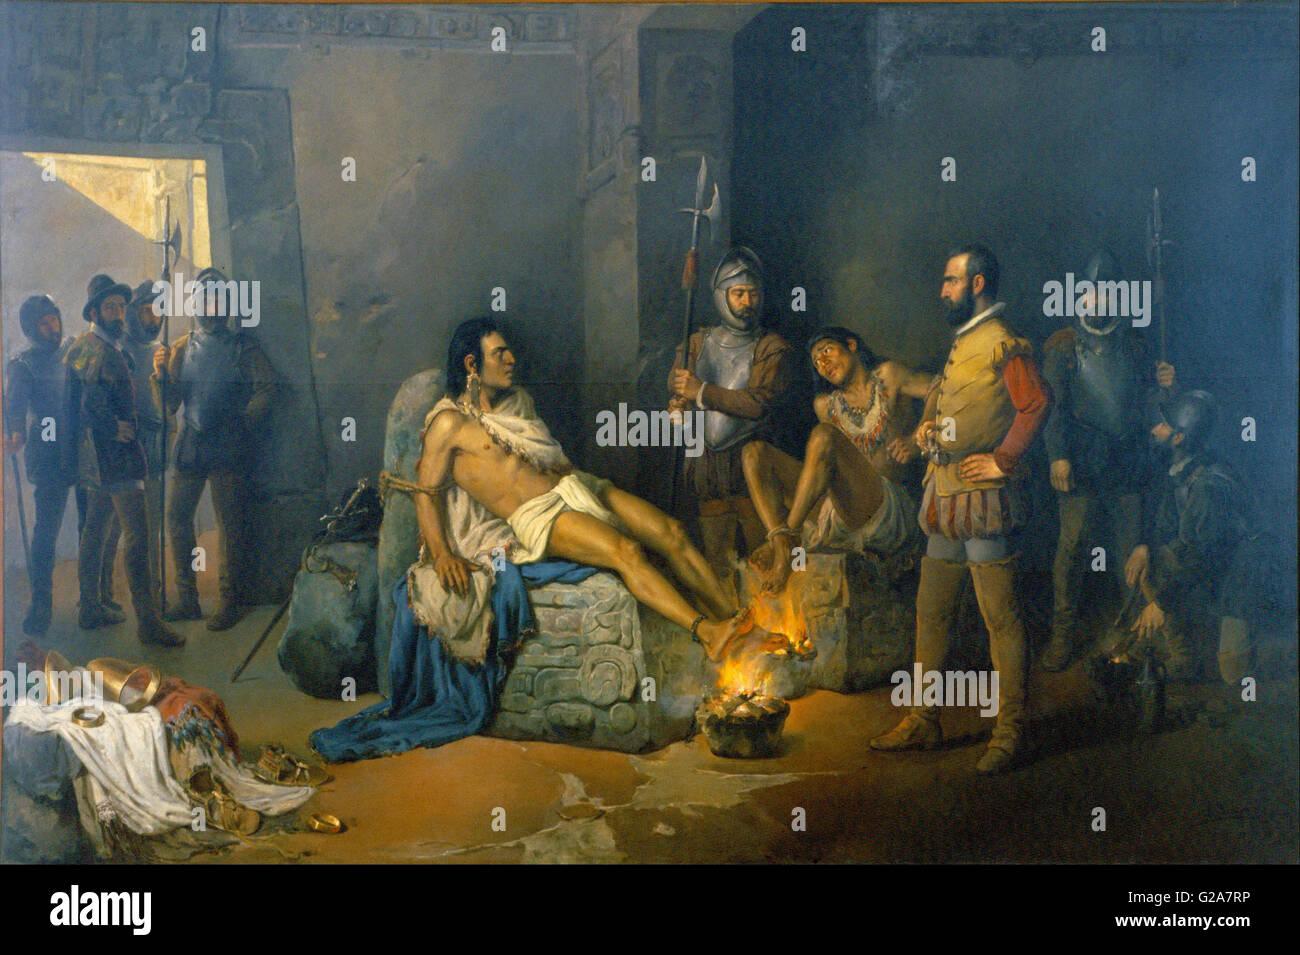 Leandro Izaguirre - The Torture of Cuauhtémoc -  Museo Nacional de Arte de Mexico - Stock Image